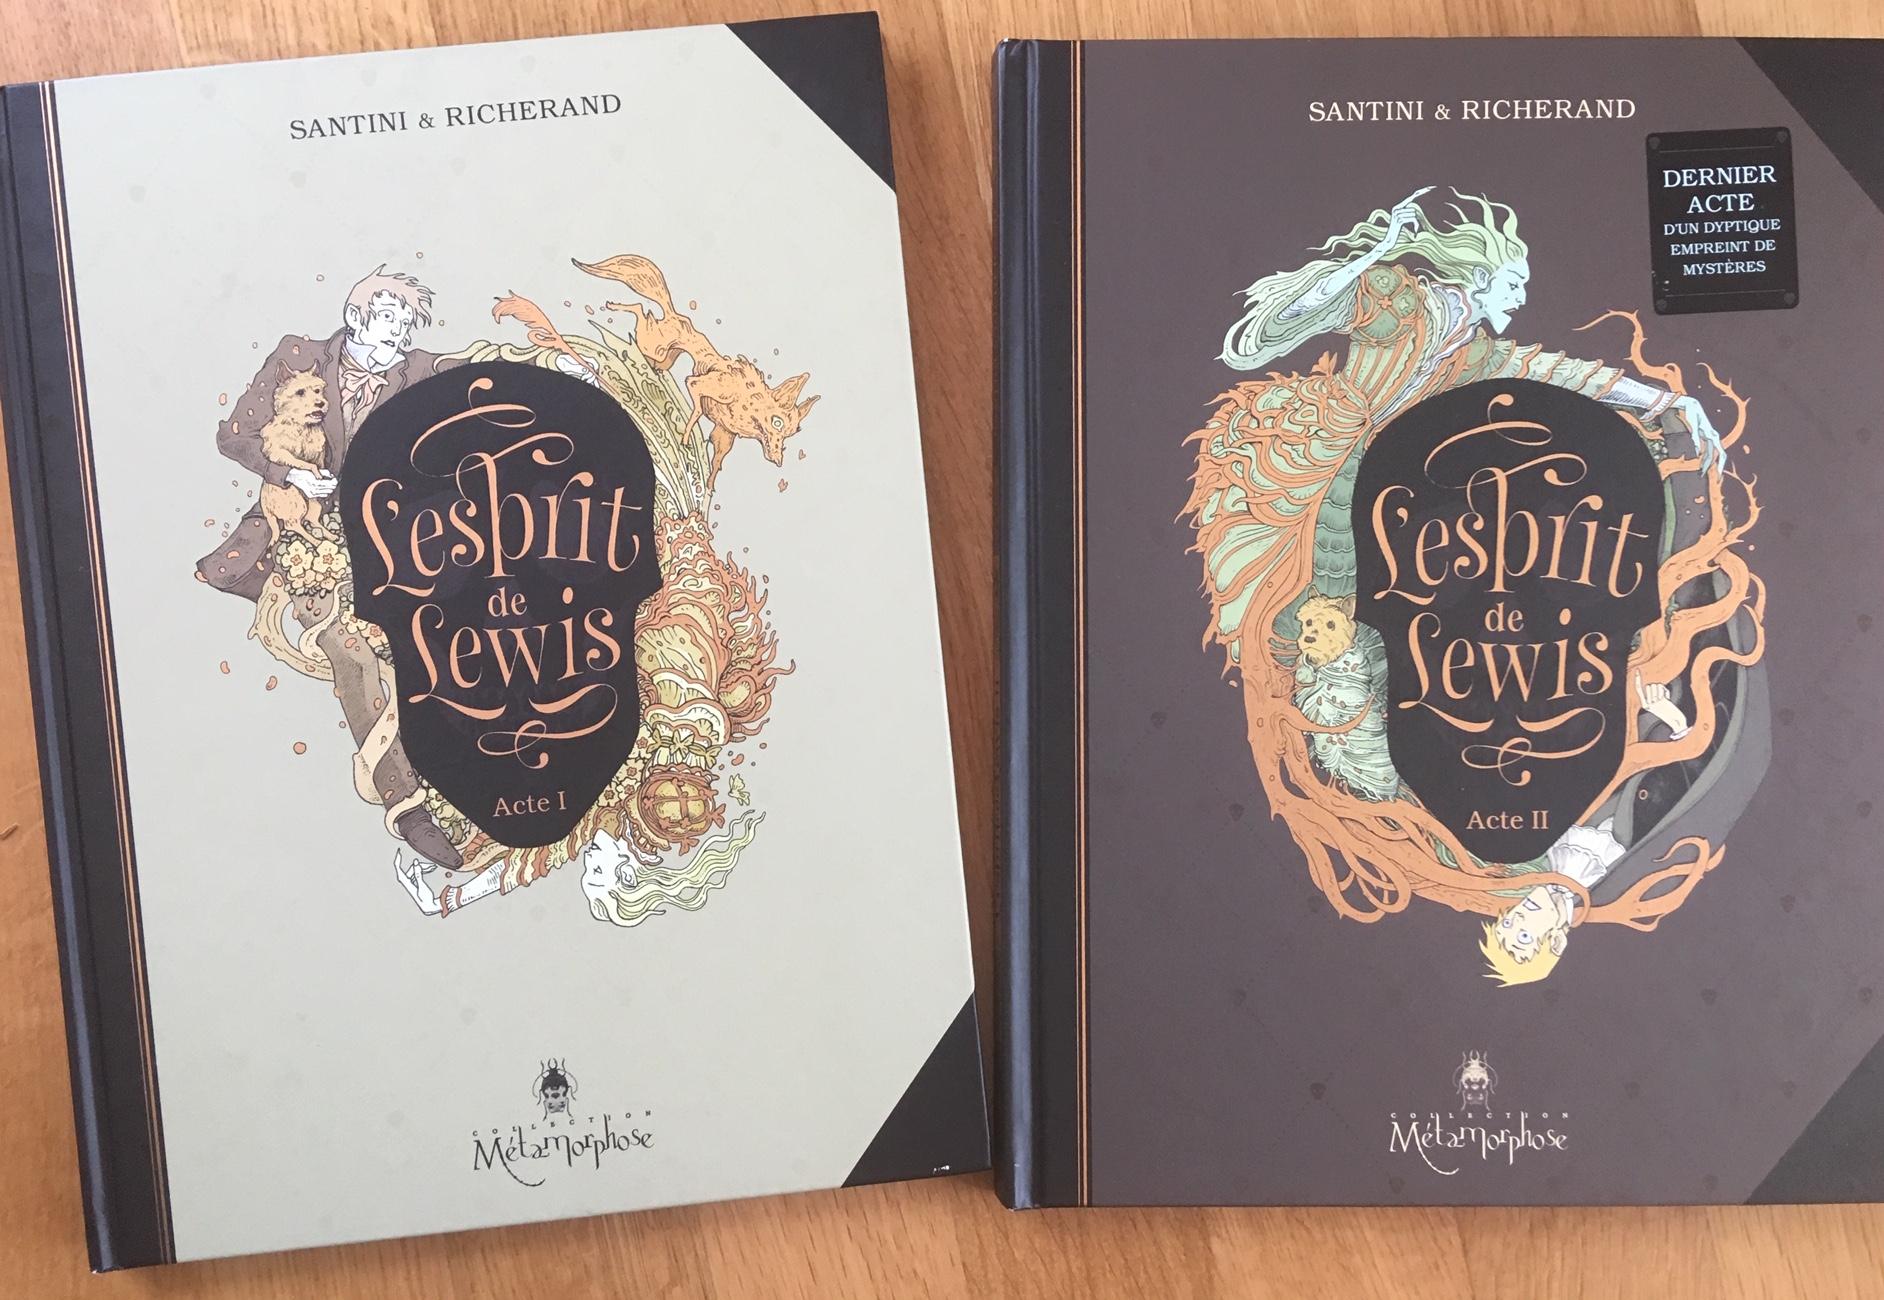 Lewis_couverture tomes 1 et 2.jpg